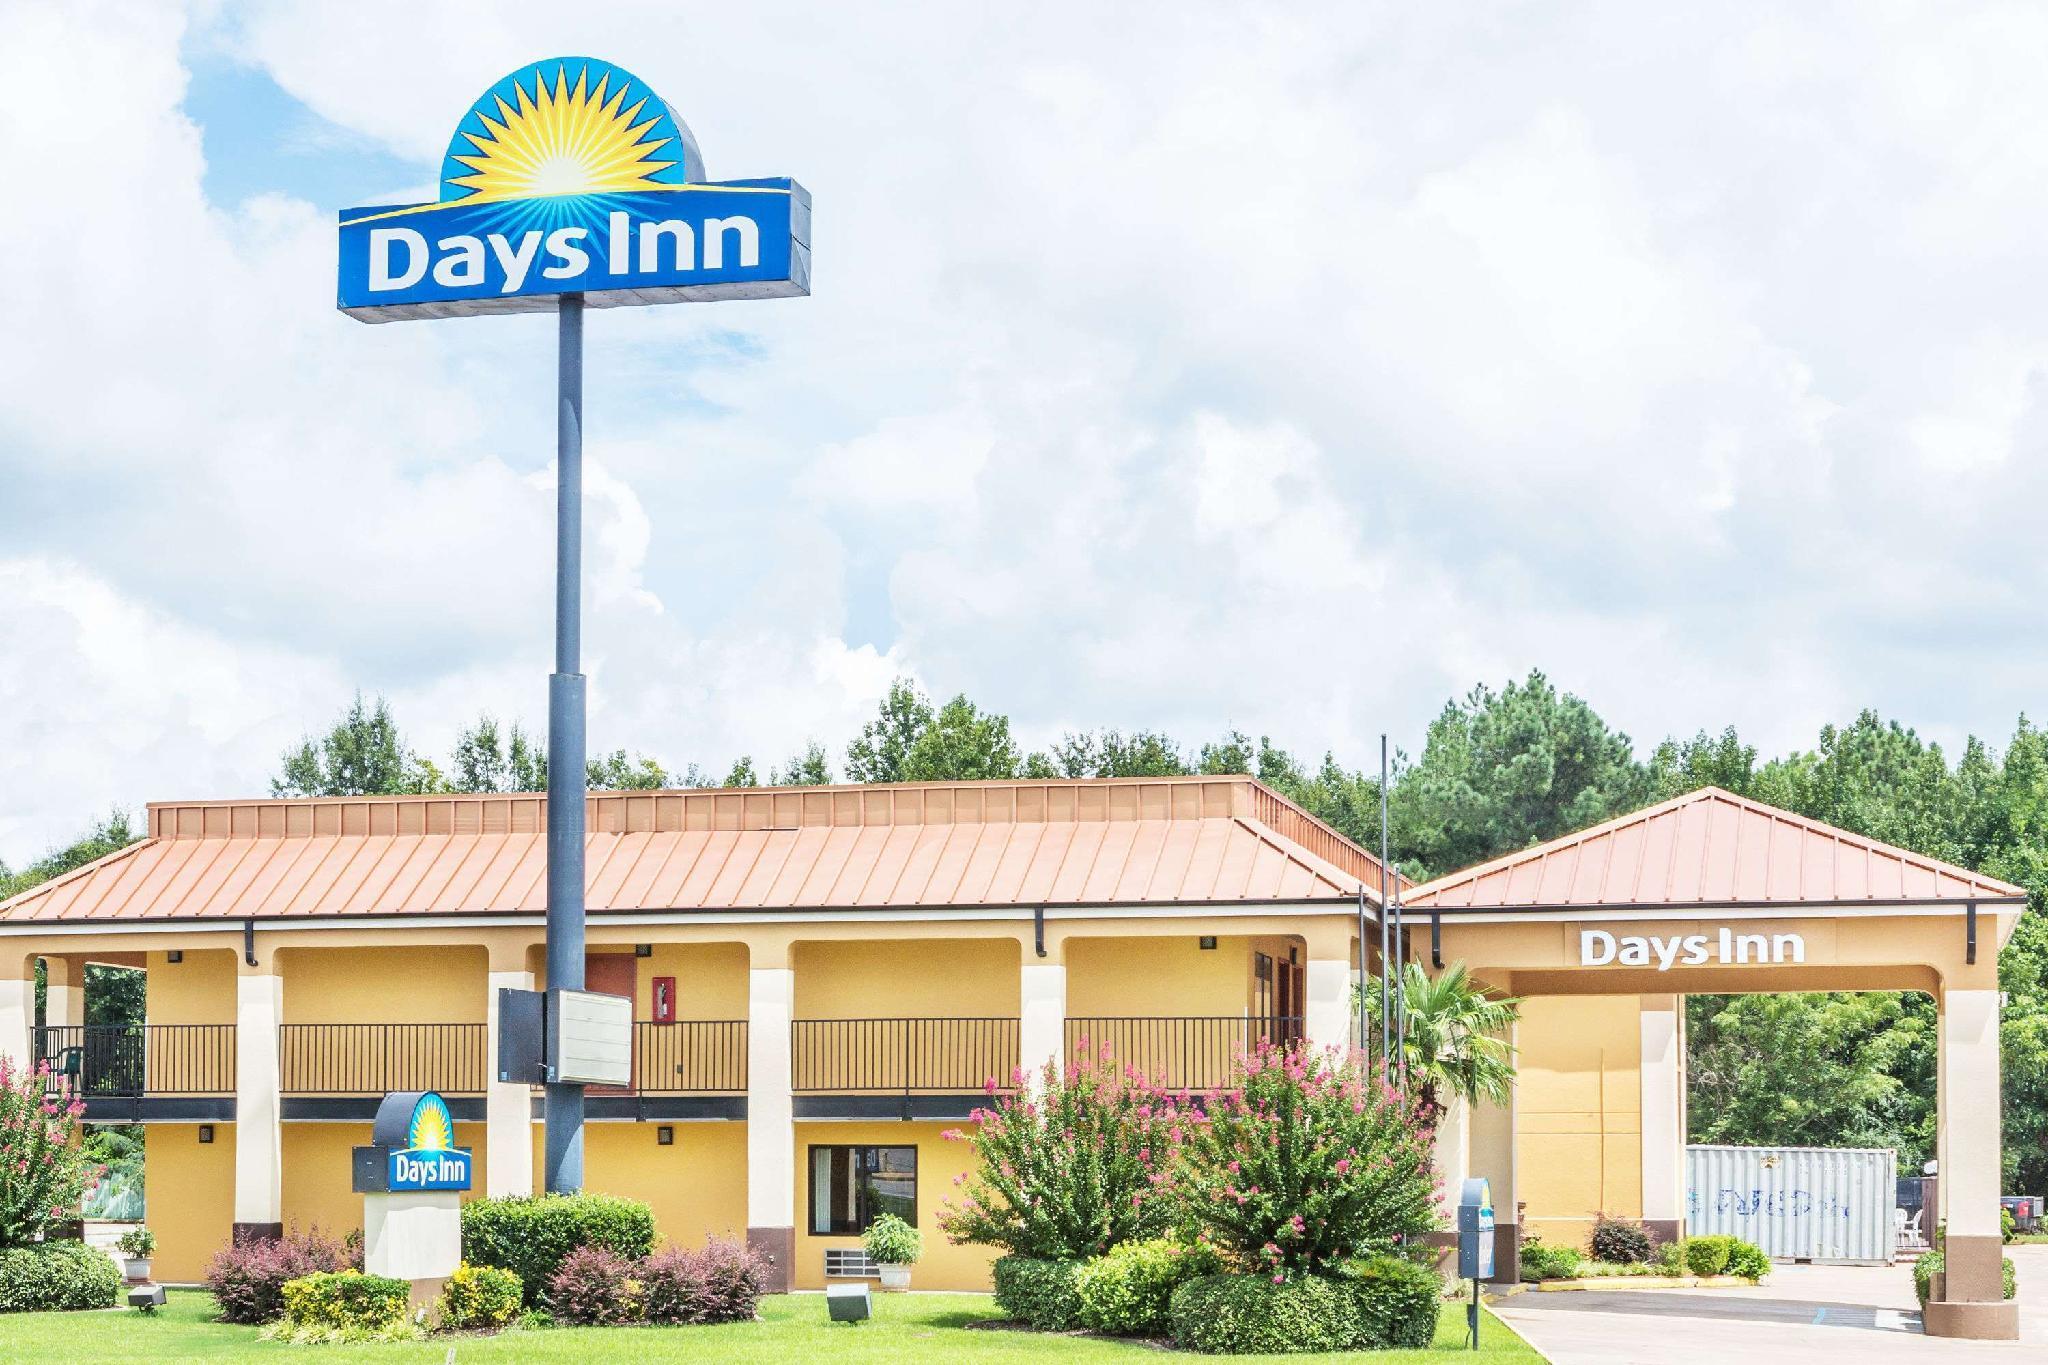 Days Inn By Wyndham Rayville